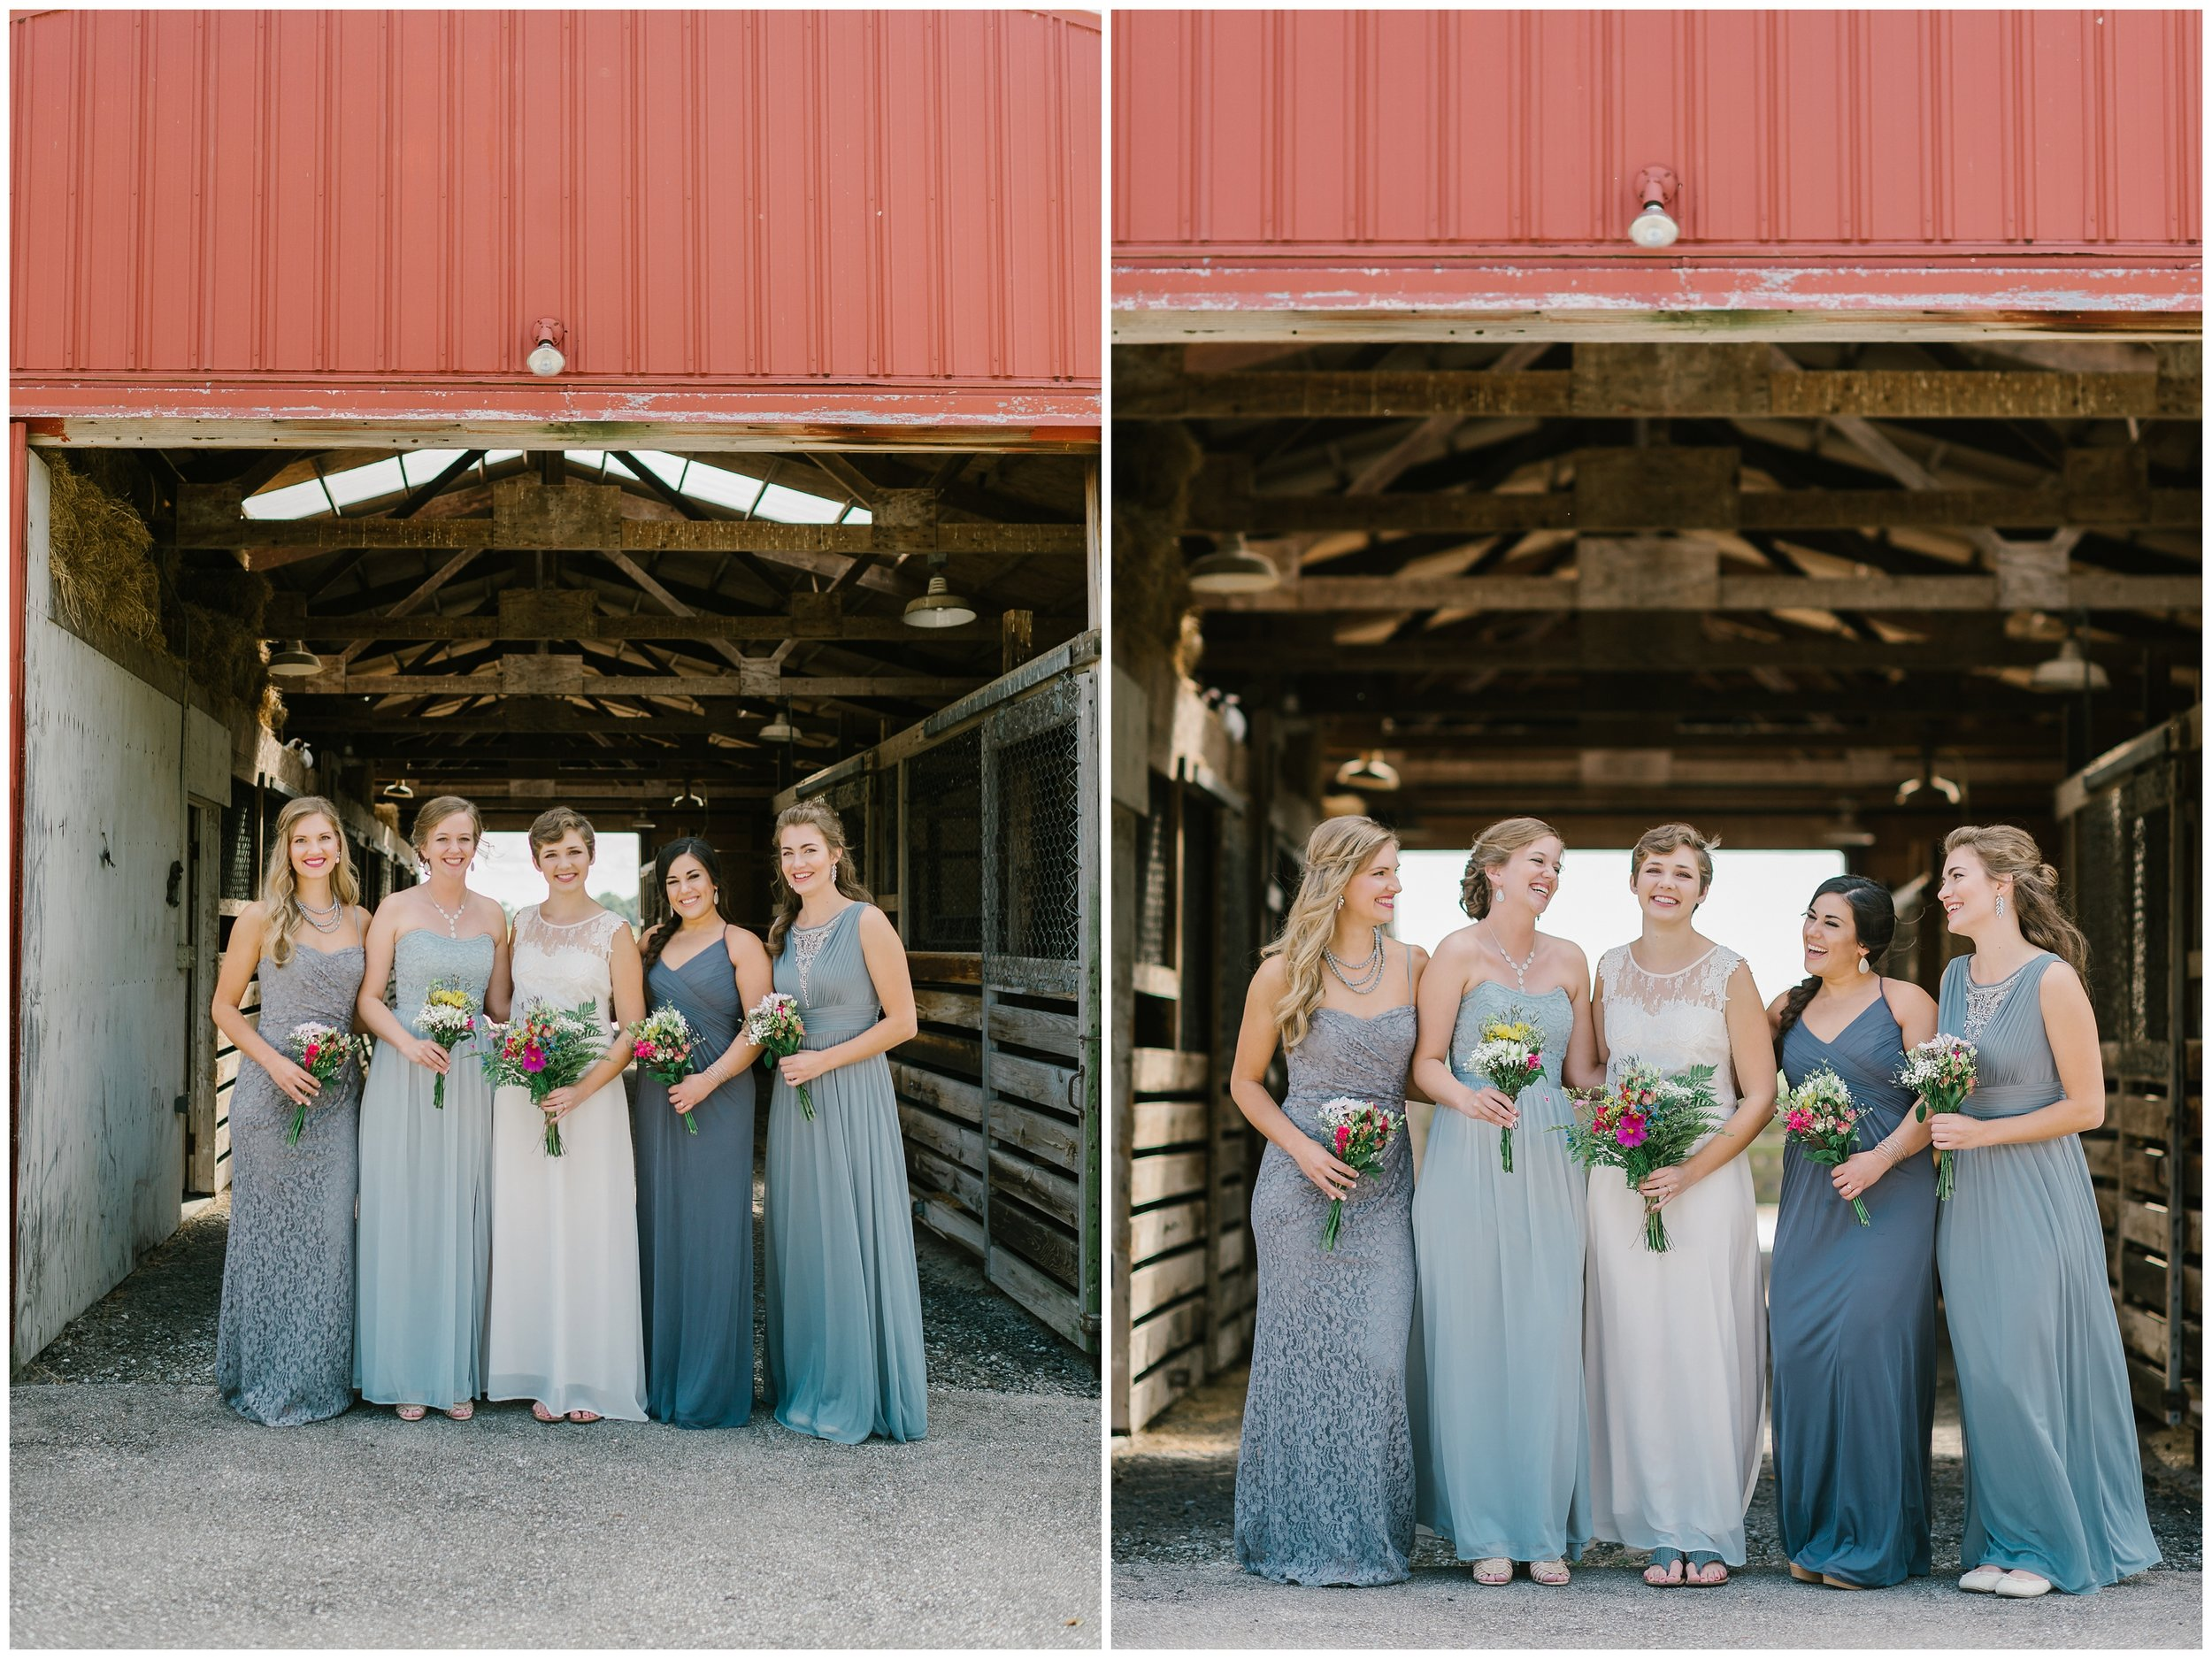 Rebecca_Shehorn_Photography_Indianapolis_Wedding_Photographer_7238.jpg